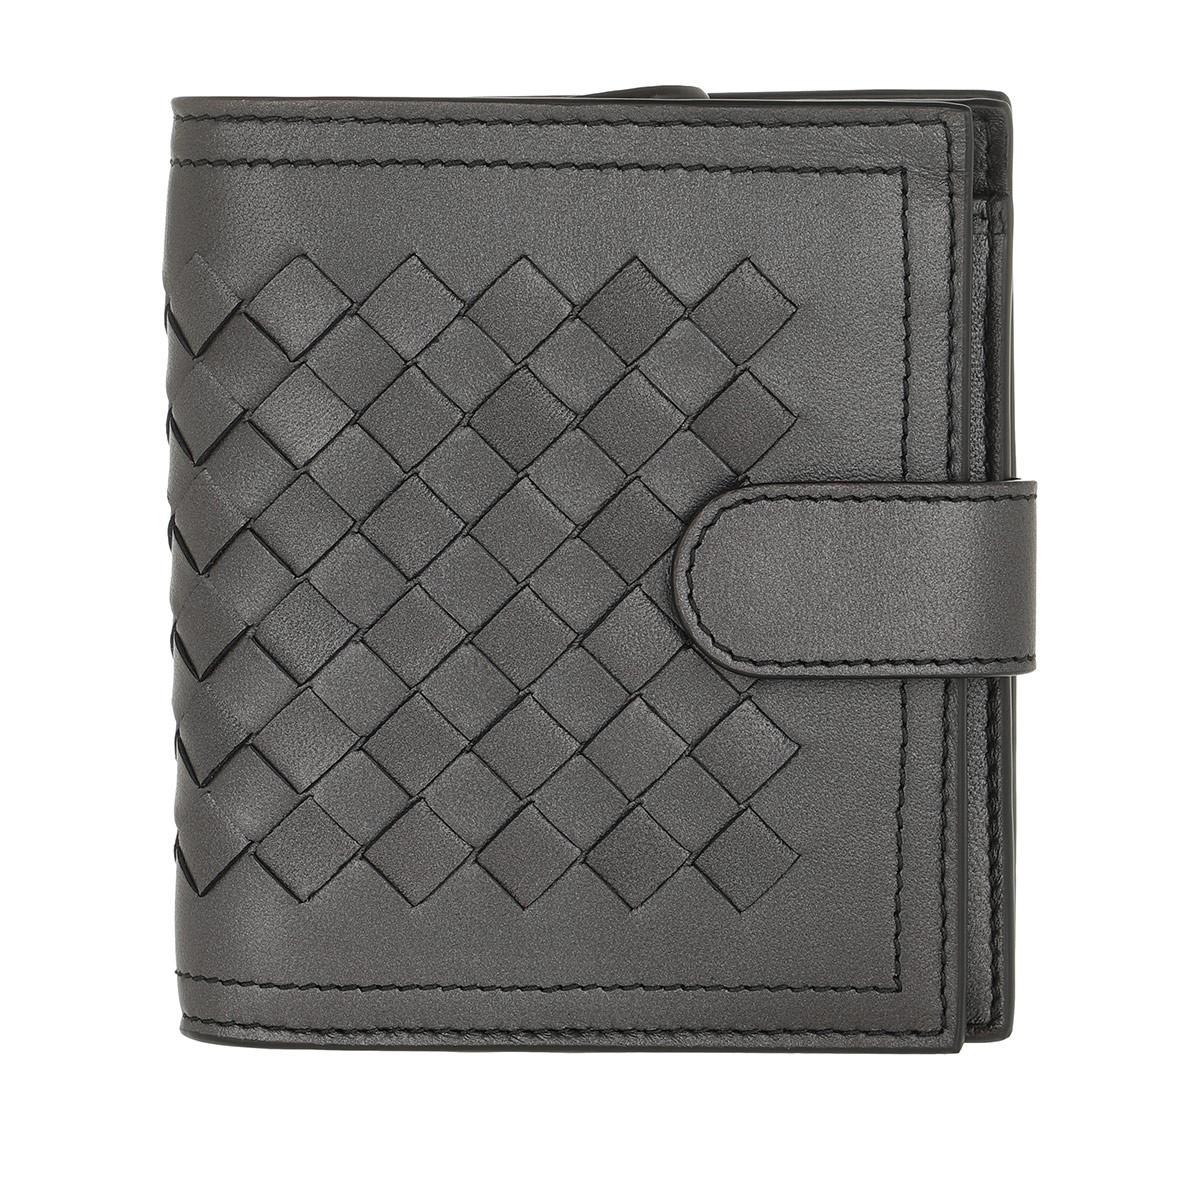 Bottega Veneta Portemonnaie - Intrecciato Mini Wallet Nappa Antique Silver - in grau - für Damen